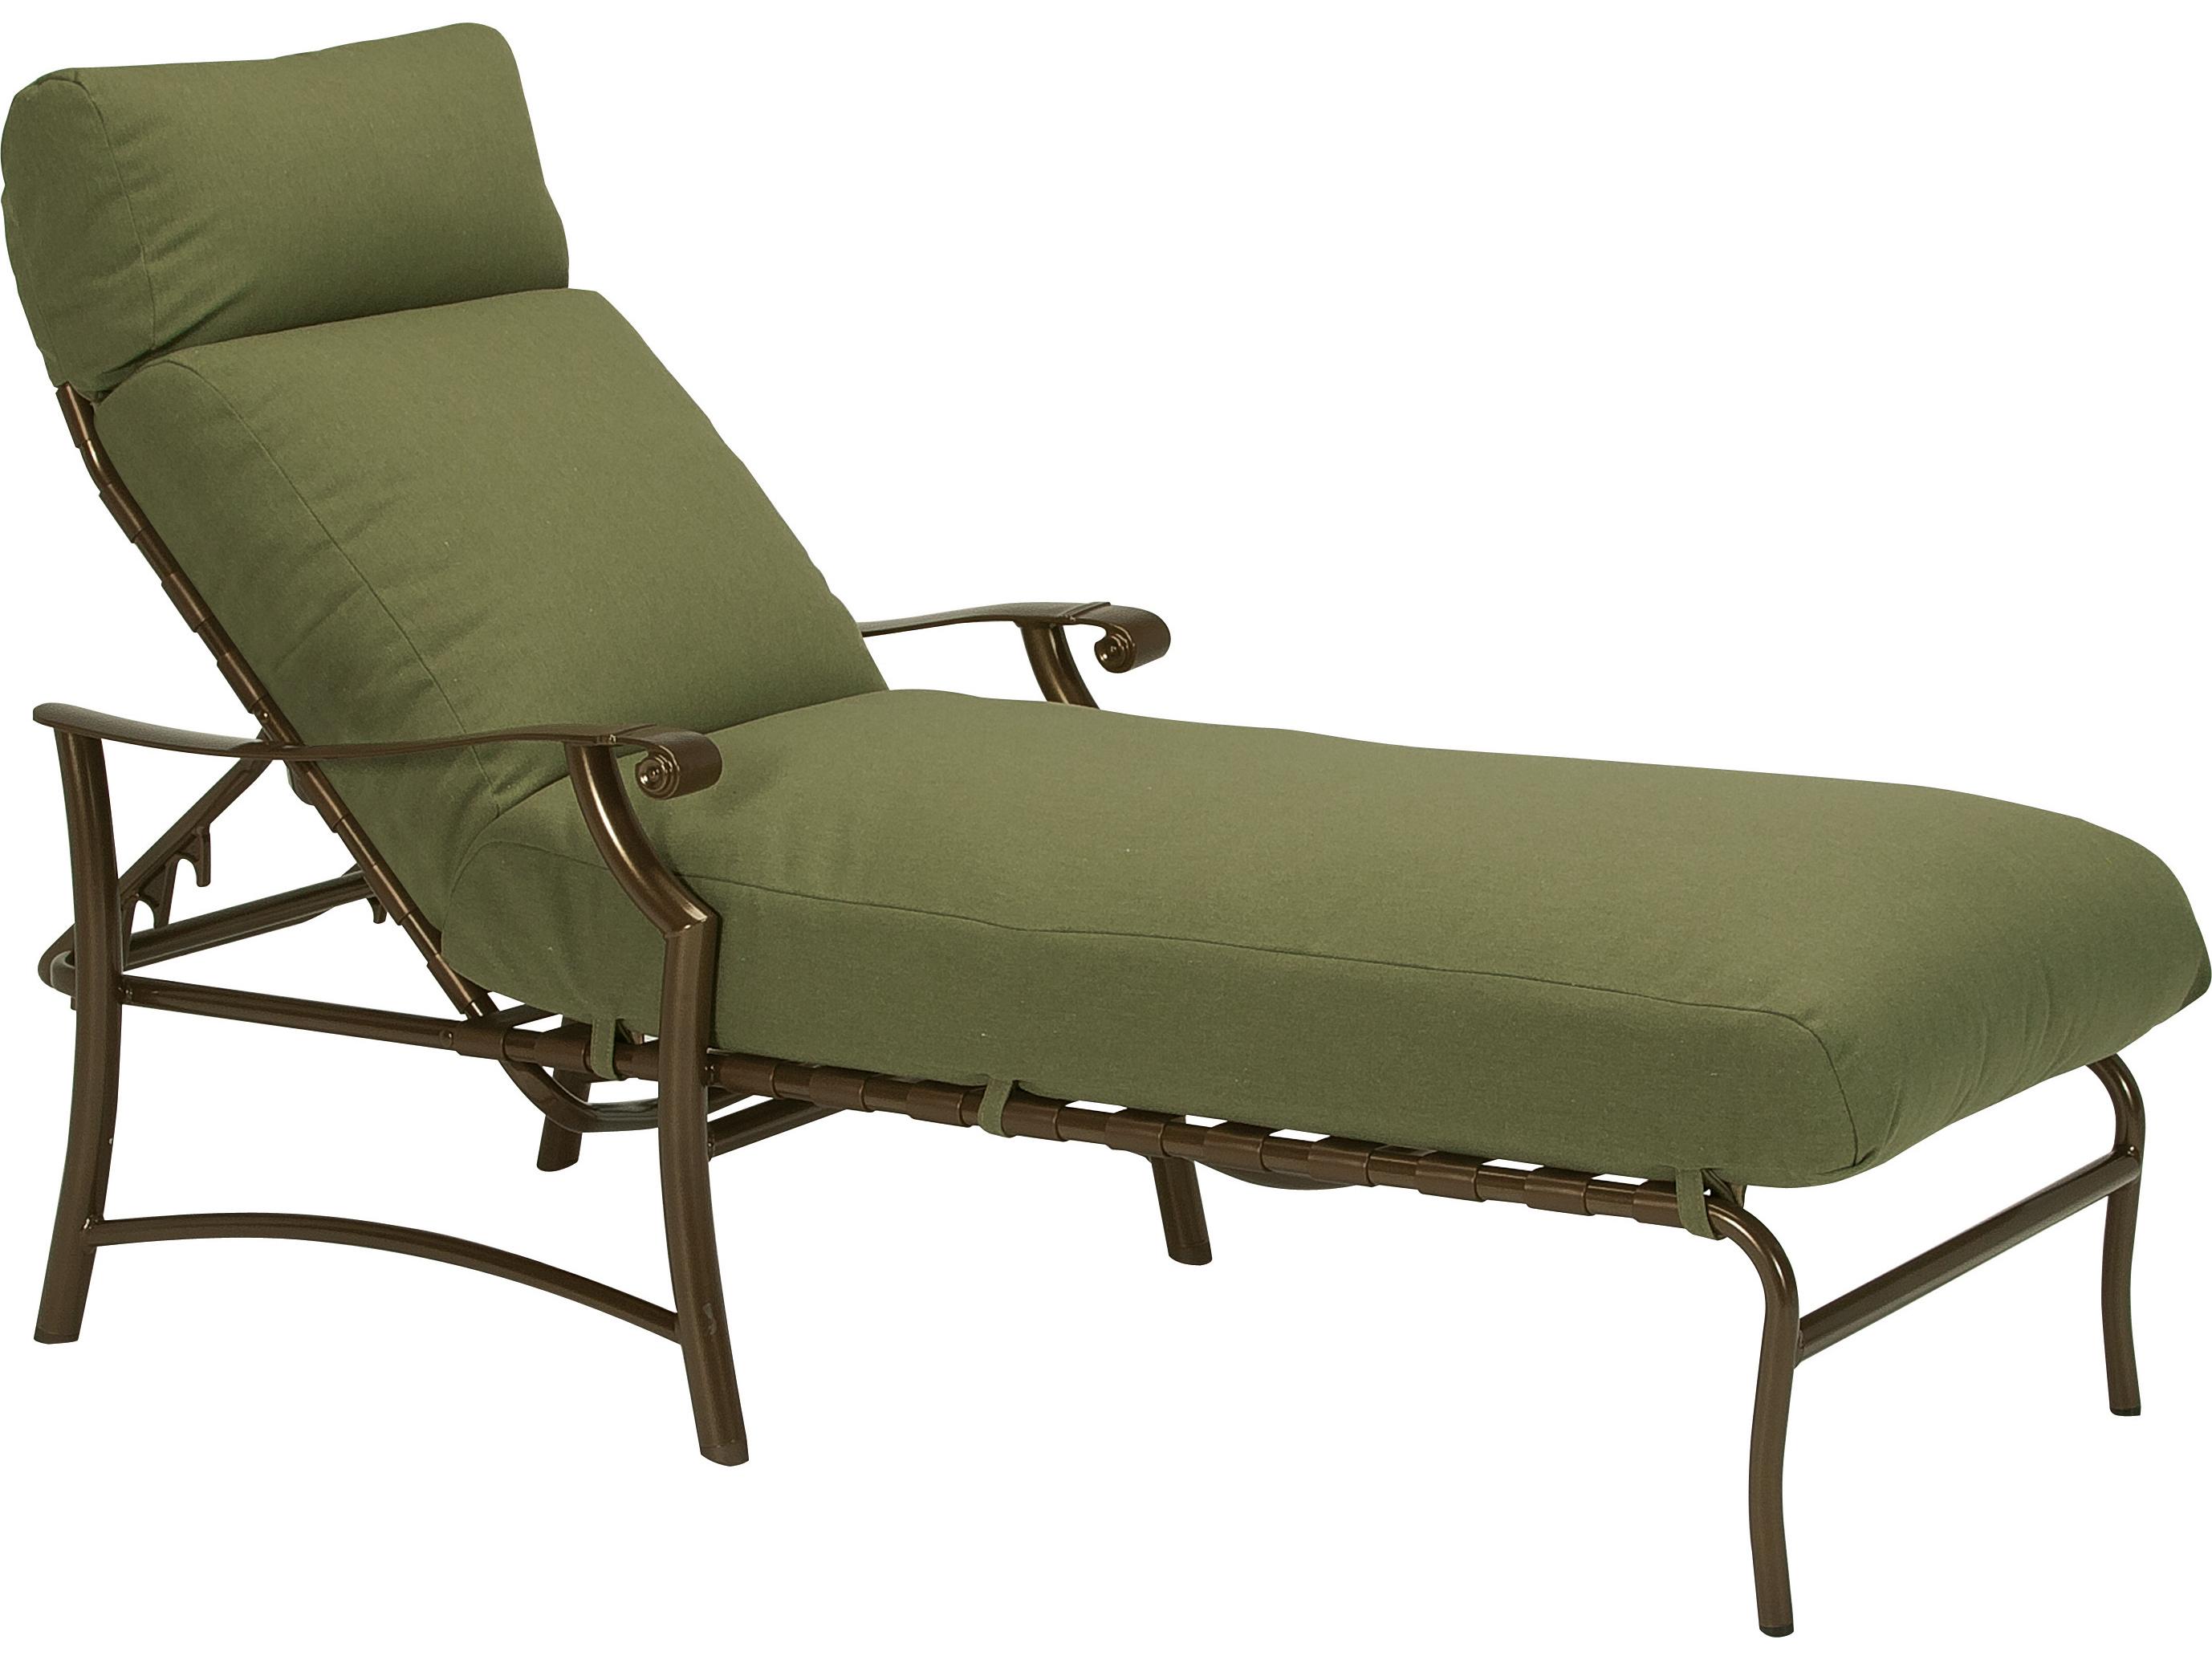 Tropitone montreaux ii relaxplus aluminum chaise lounge for Chaise lounge aluminum